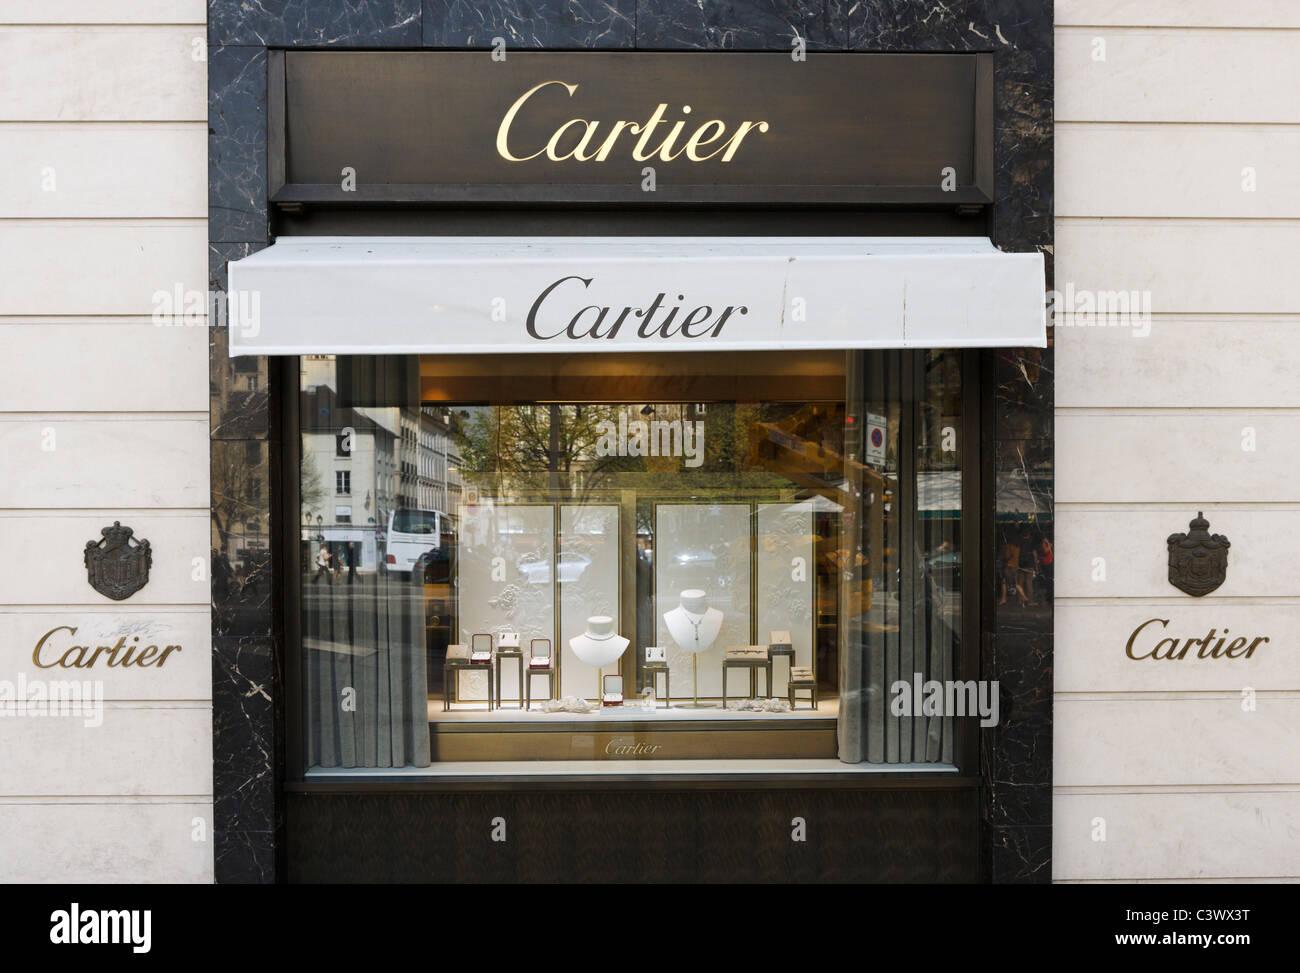 Cartier store on Rue Rennes just off the Boulevard St Germain, Saint Germain, Paris, France - Stock Image